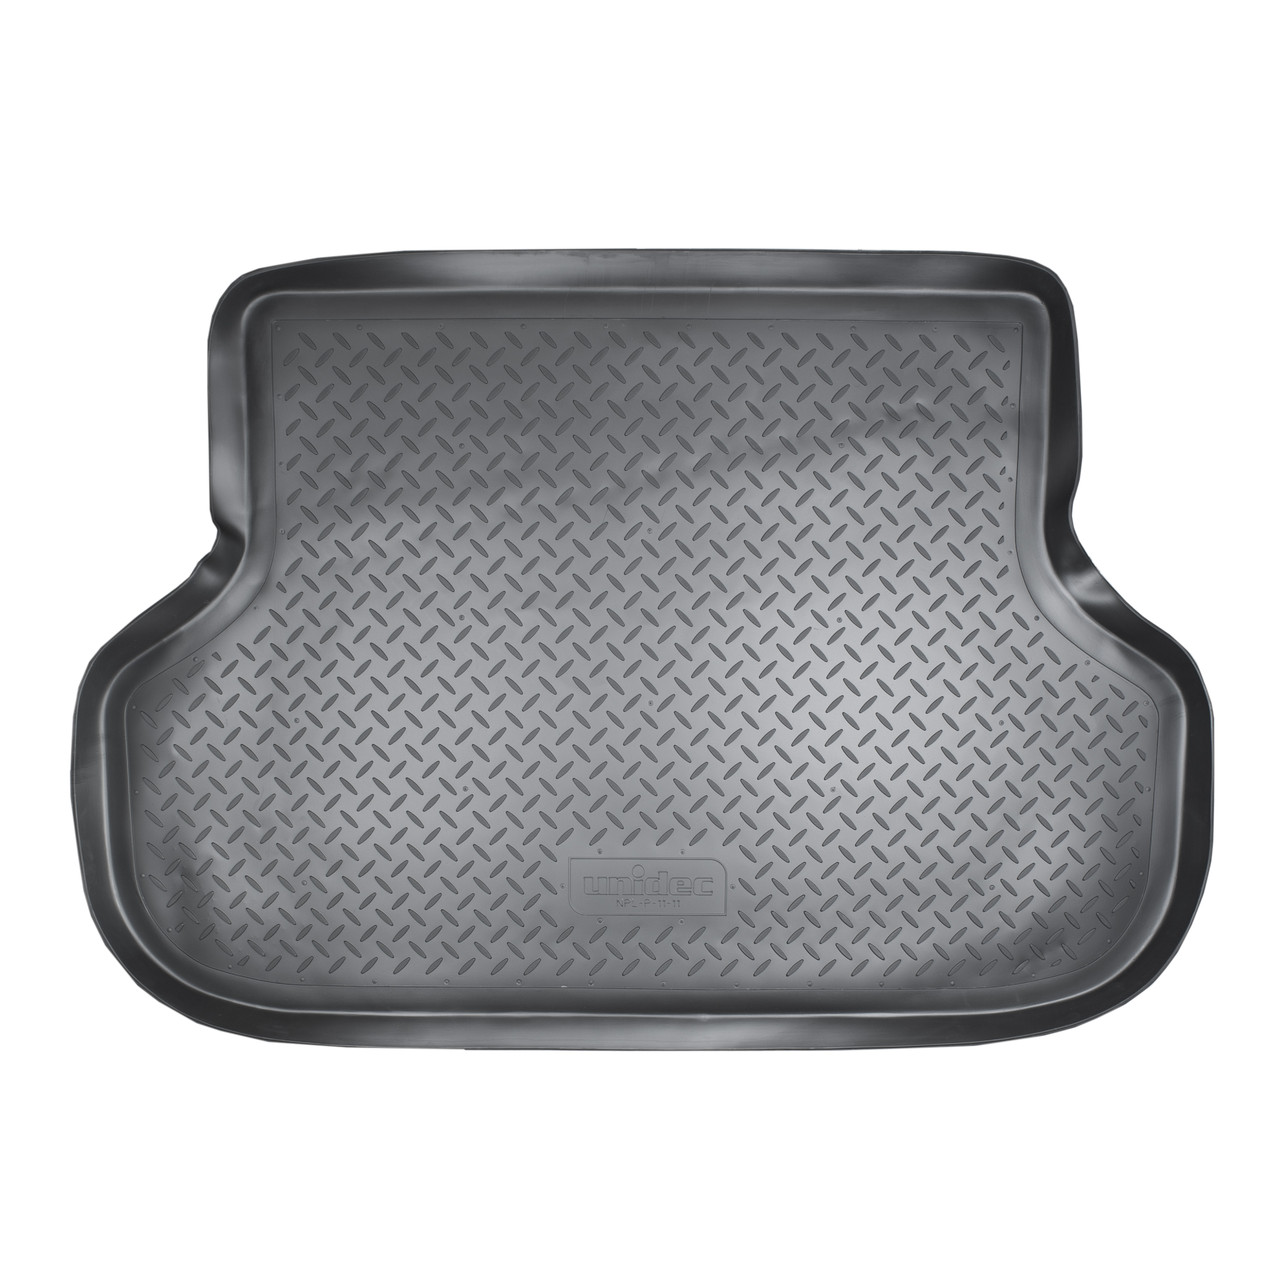 Коврик в багажник Chery Fora седан (2006-2010)